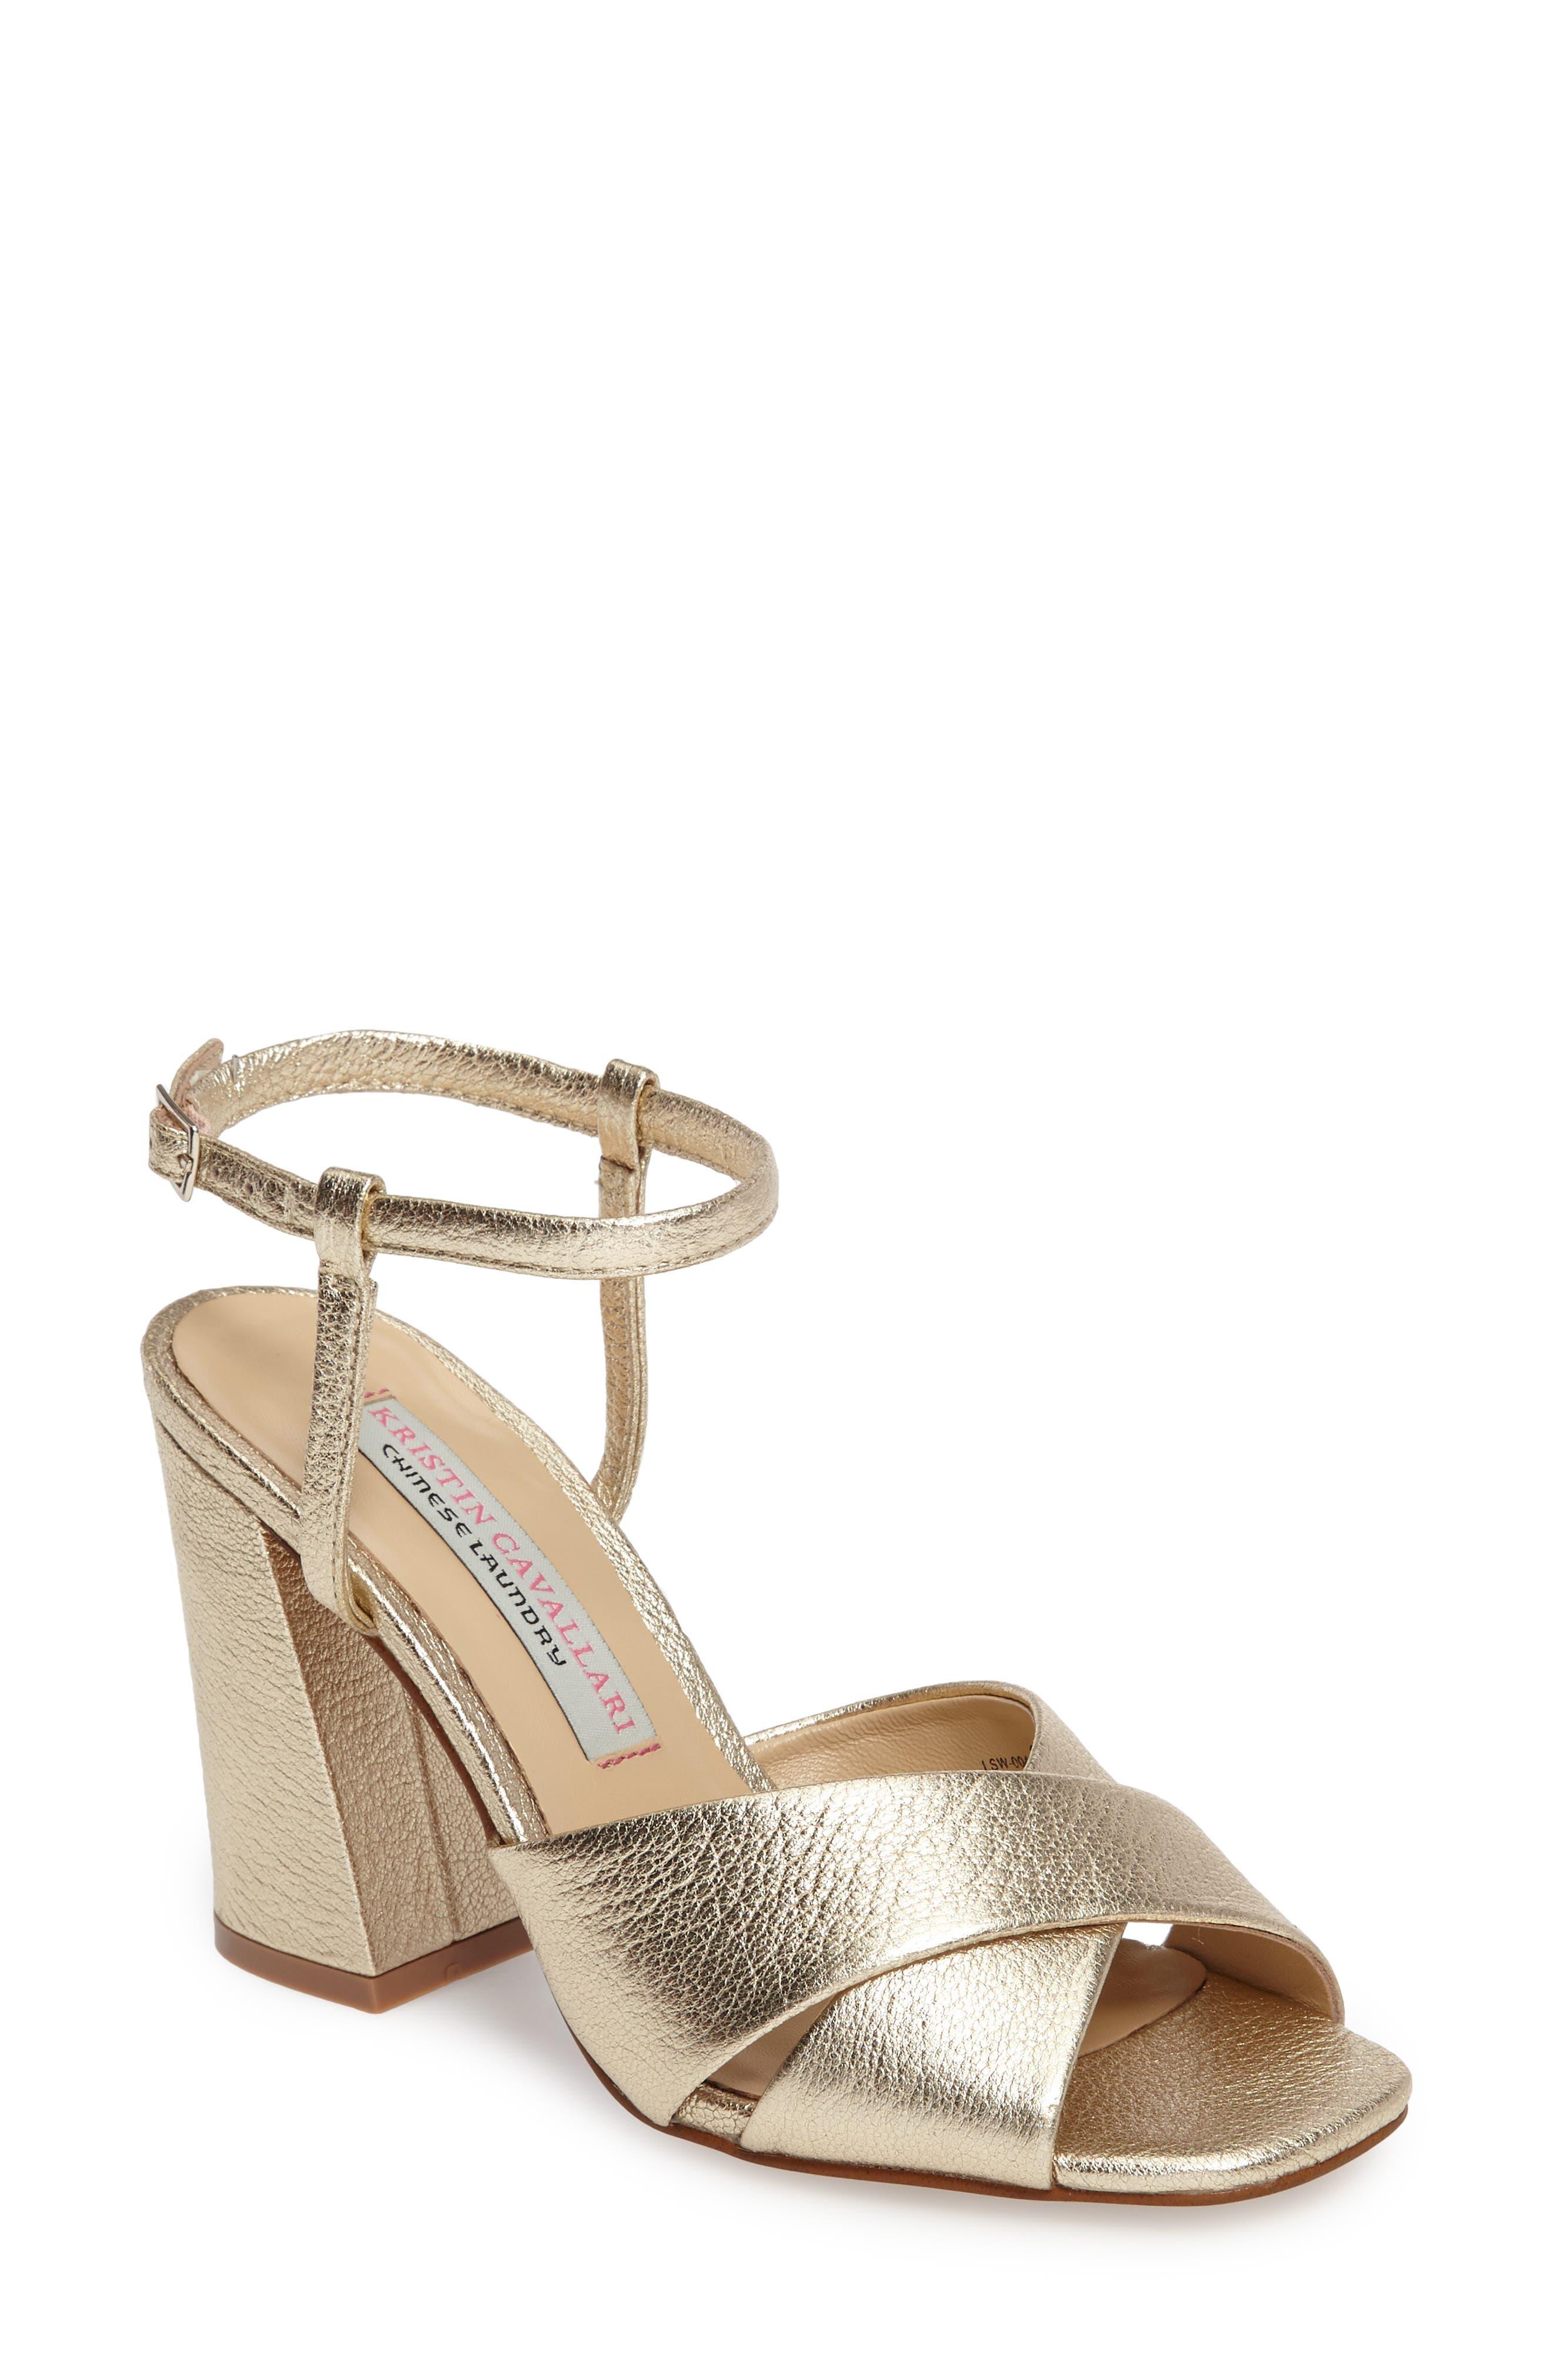 Kristin Cavallari Low Light Cross Strap Sandal (Women)